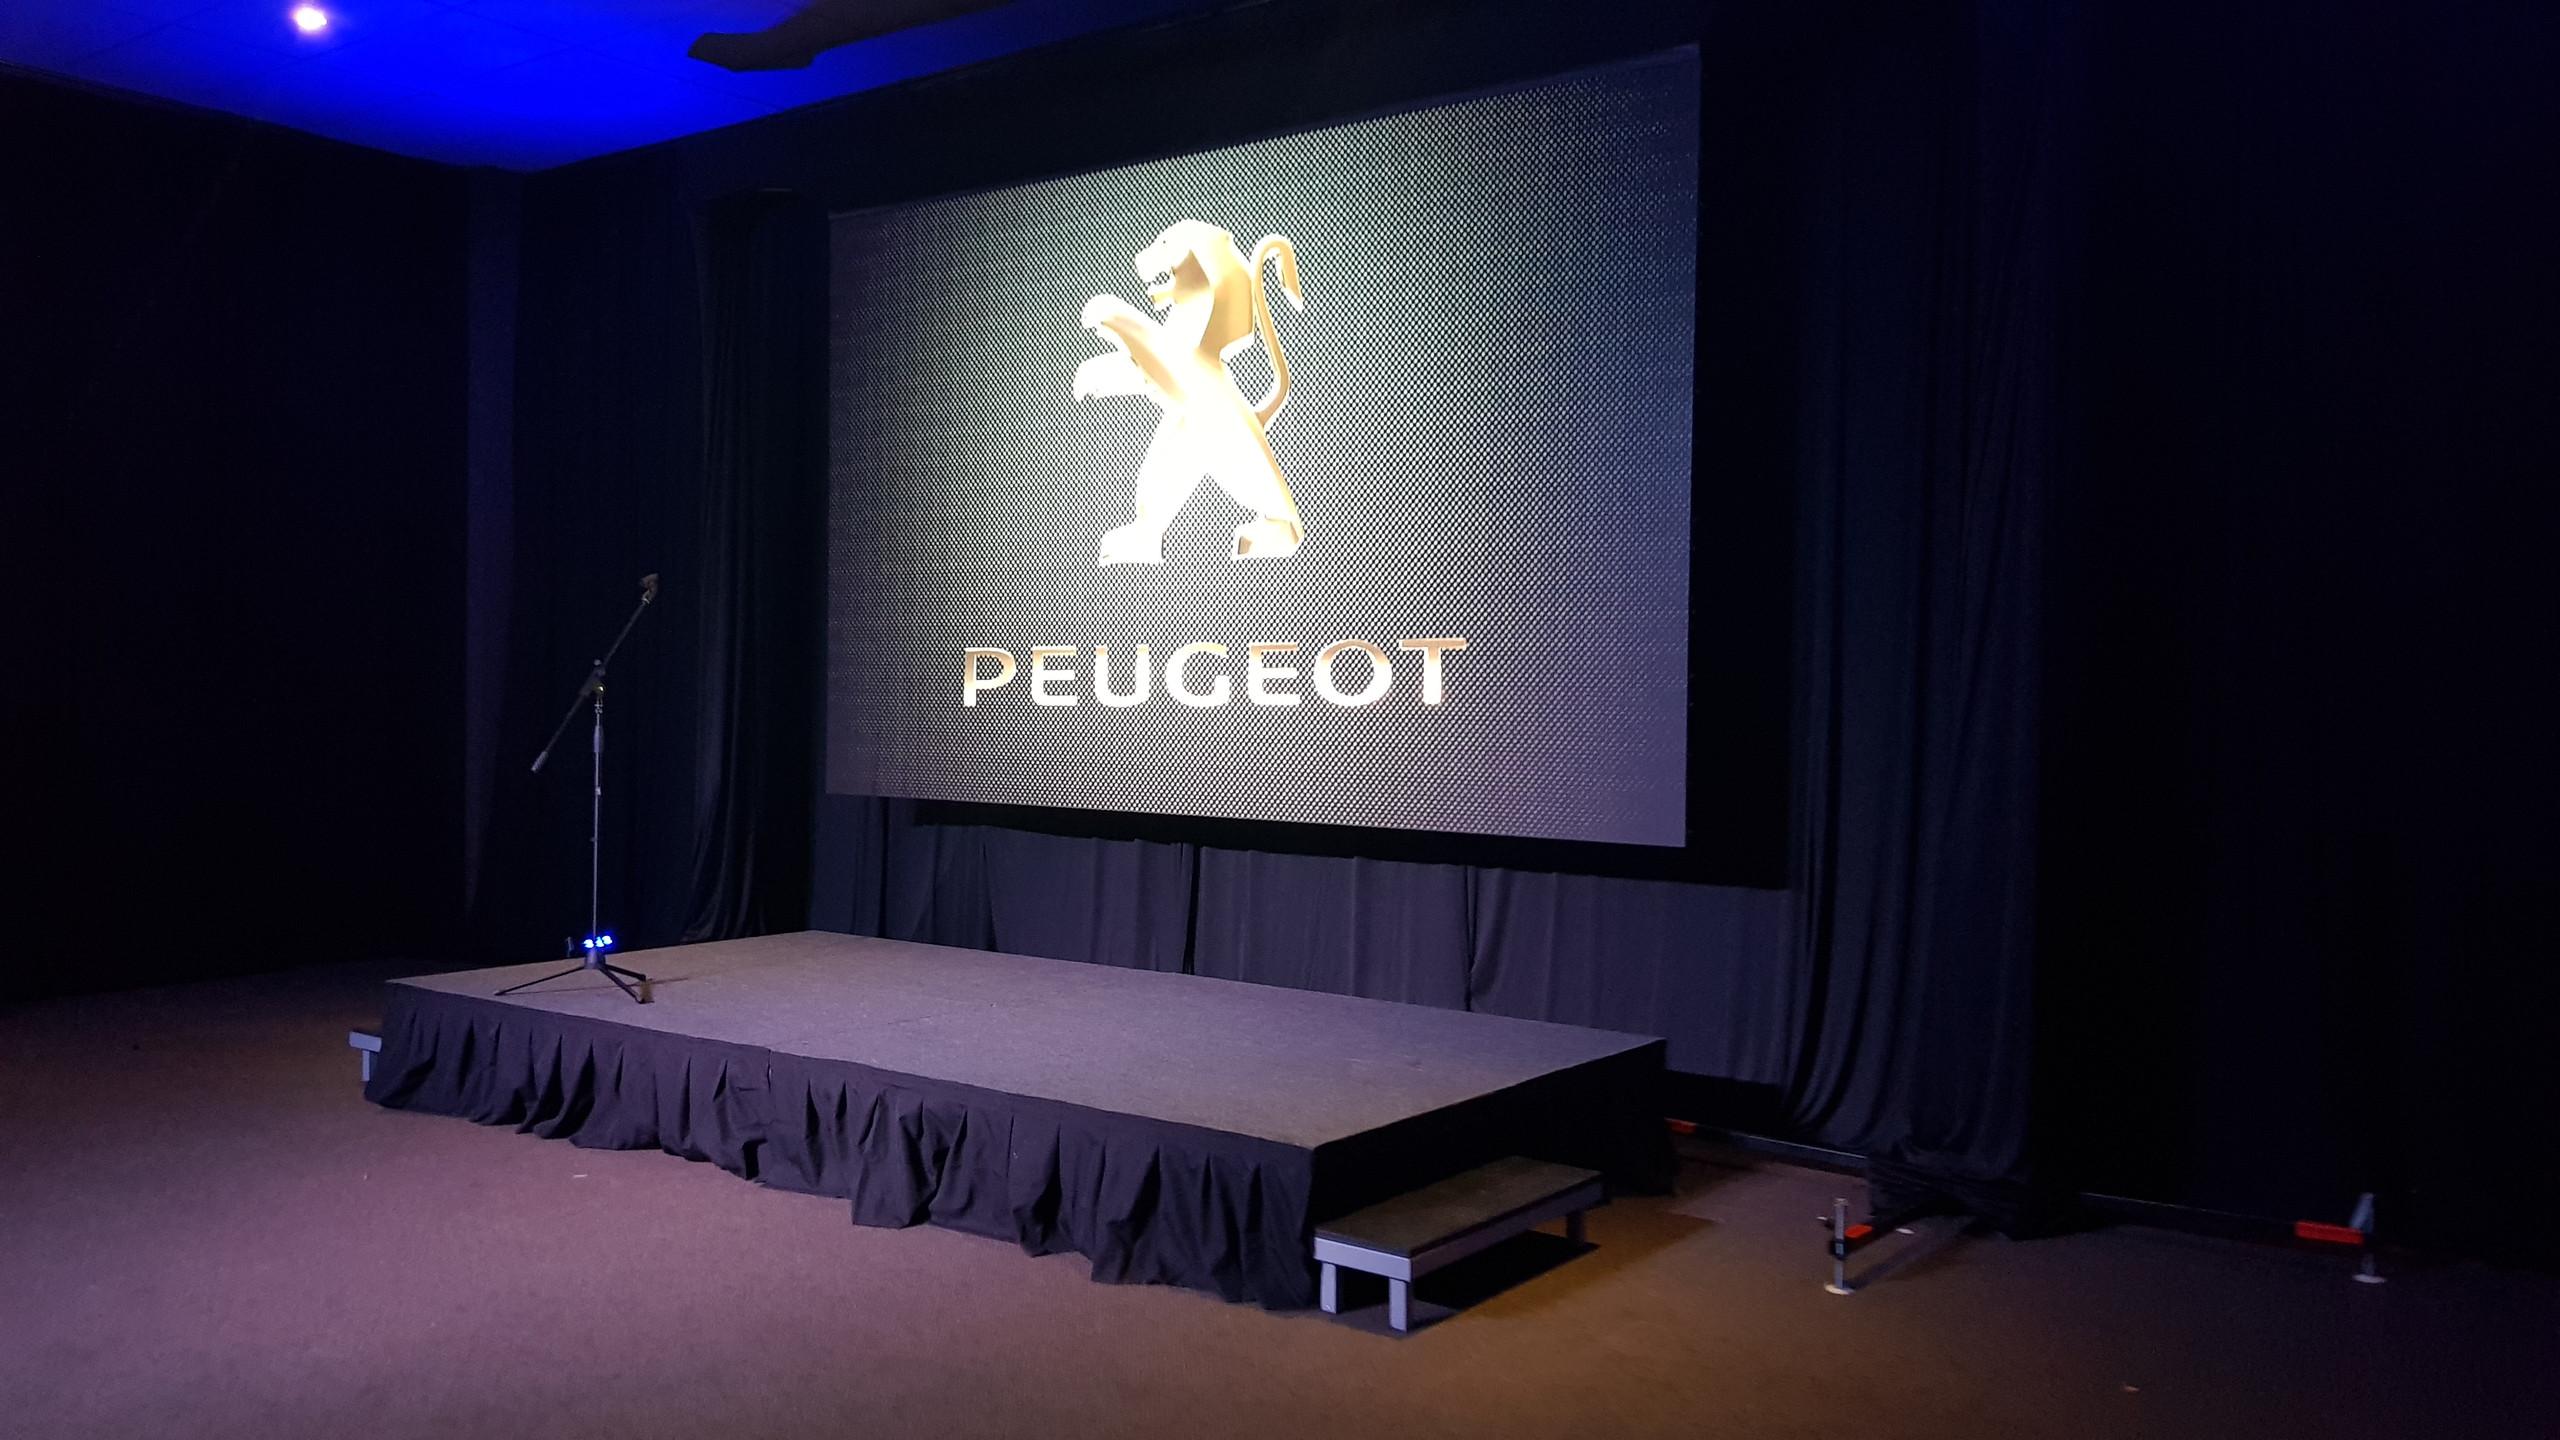 Lanzamiento Peugeot 3008 - 5008